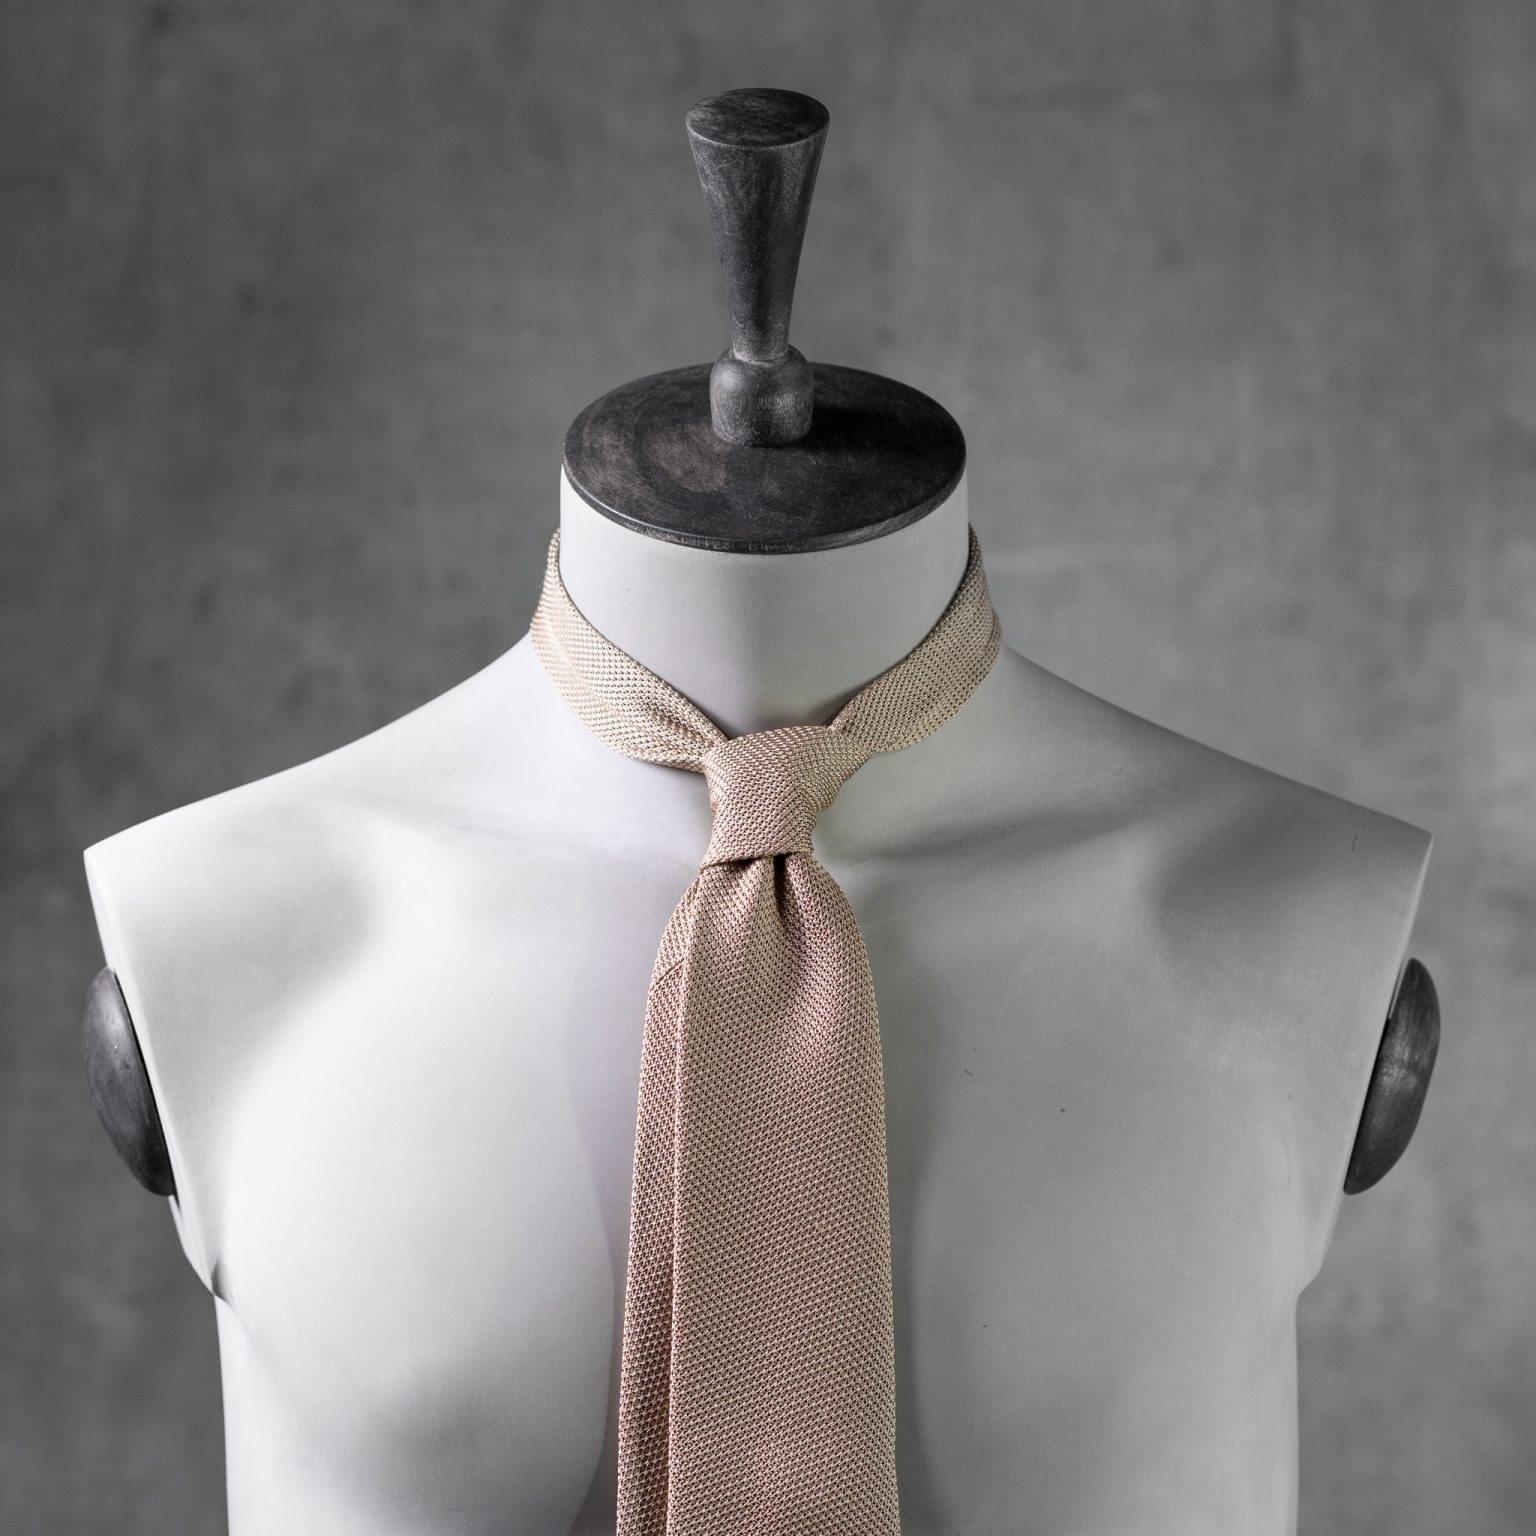 GRENADINE-0463-Tie-Initials-Corbata-Iniciales-The-Seelk-3